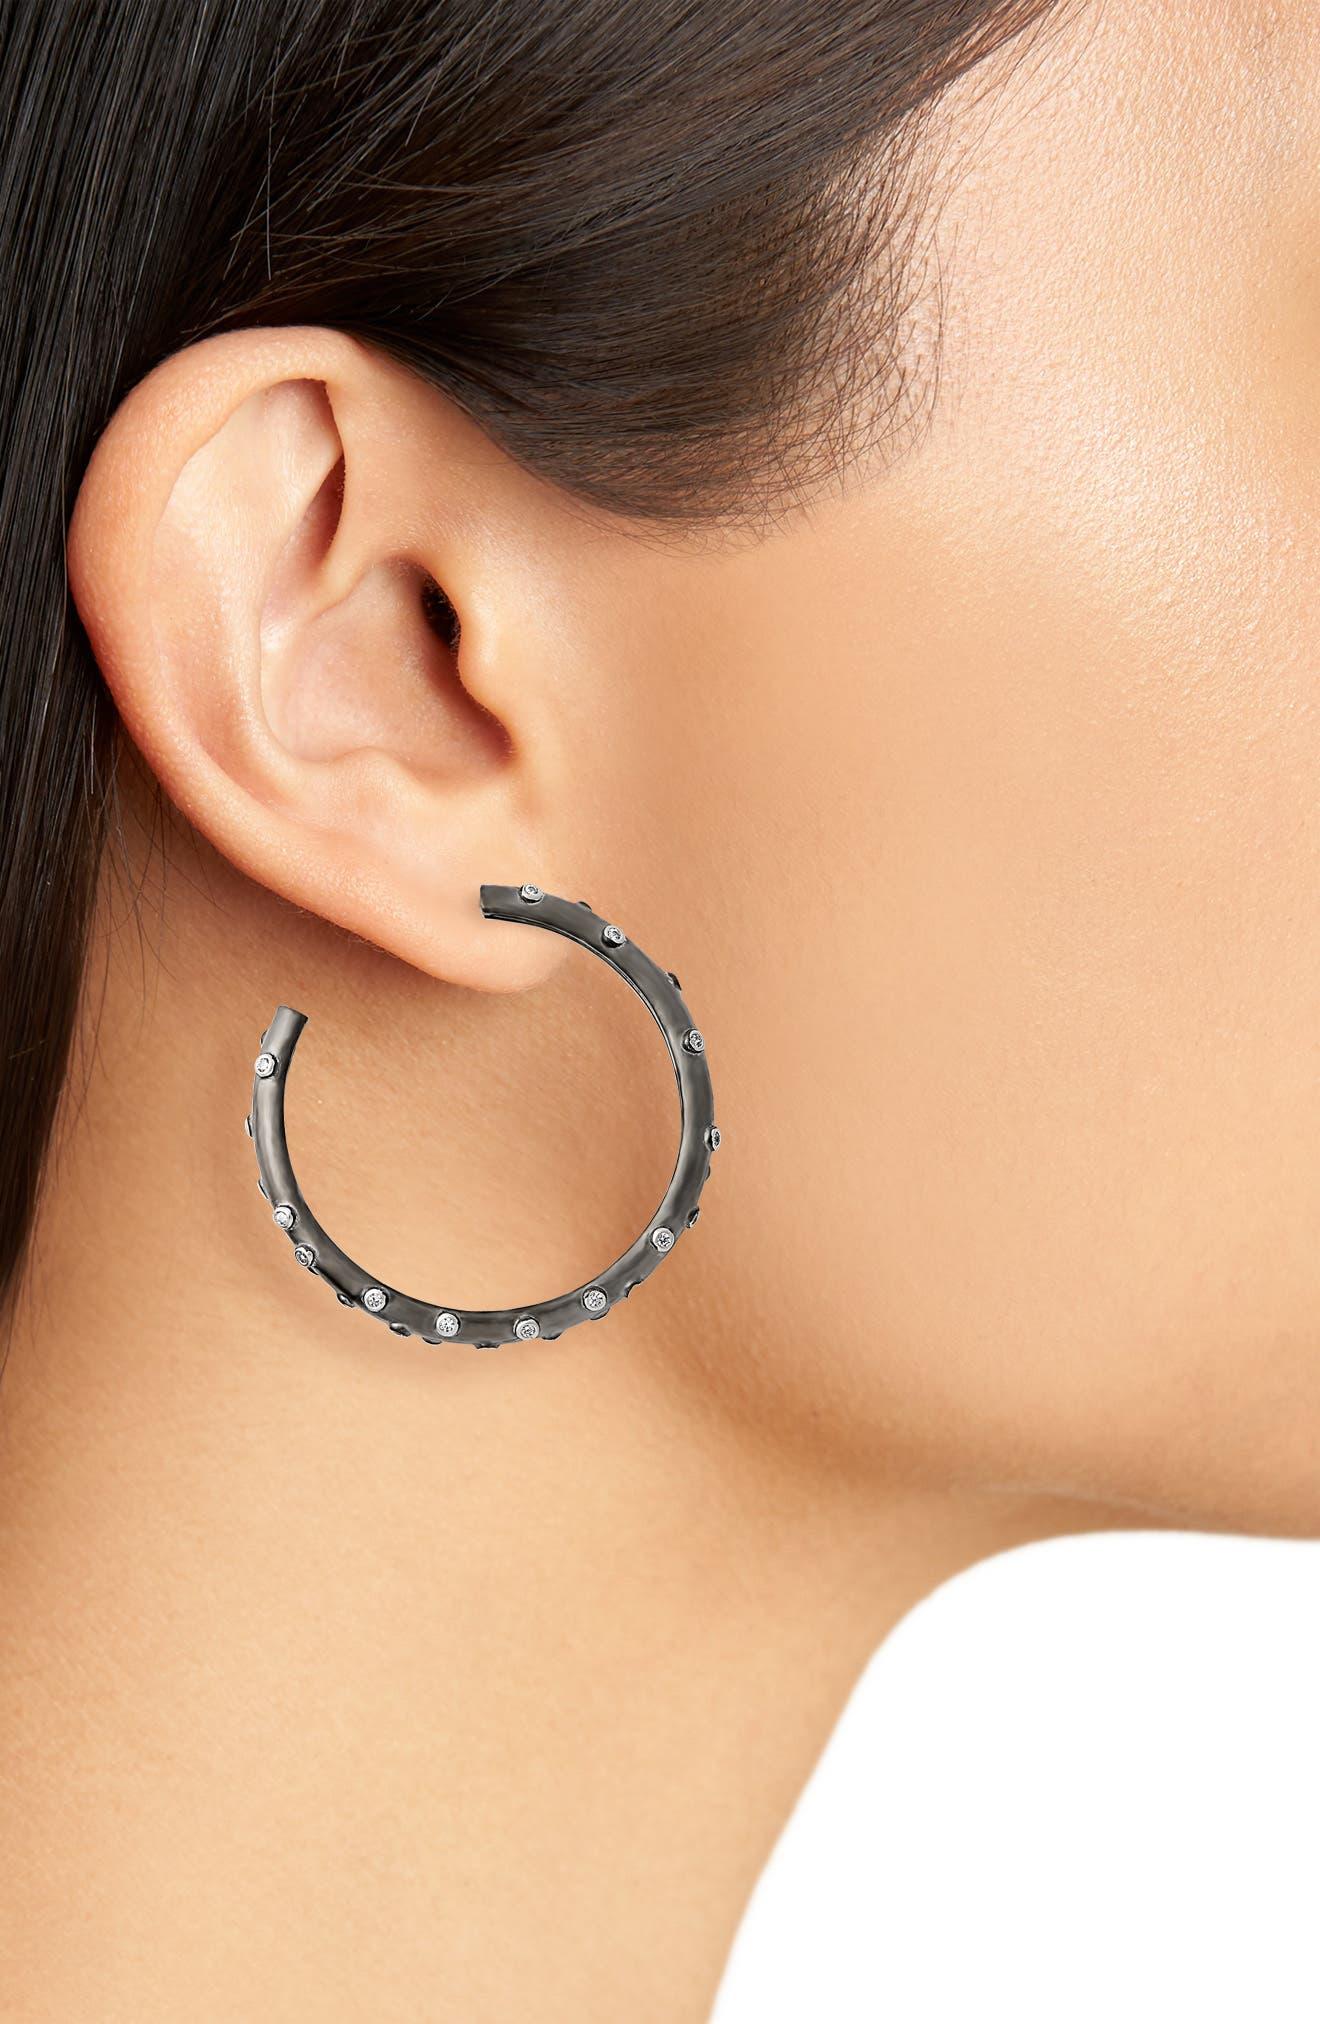 Chunky C-Hoop Earrings,                             Alternate thumbnail 2, color,                             BLACK/ WHITE/ SILVER